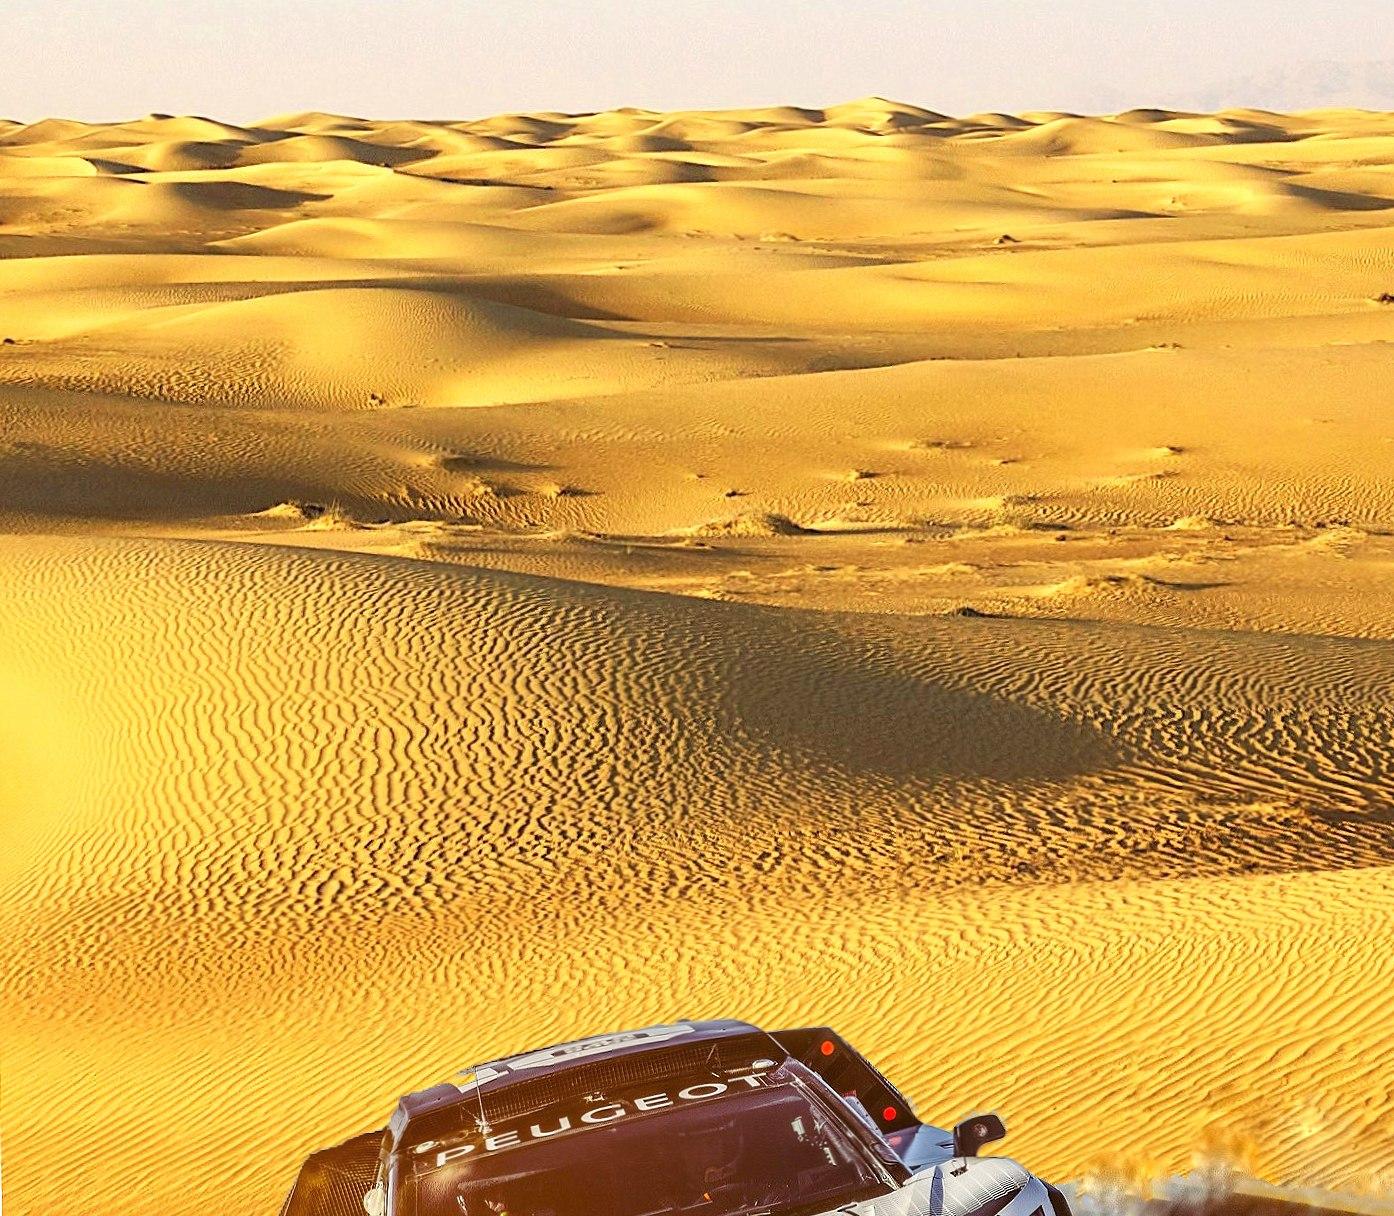 Peugeot 3008 Dakar wallpapers HD quality